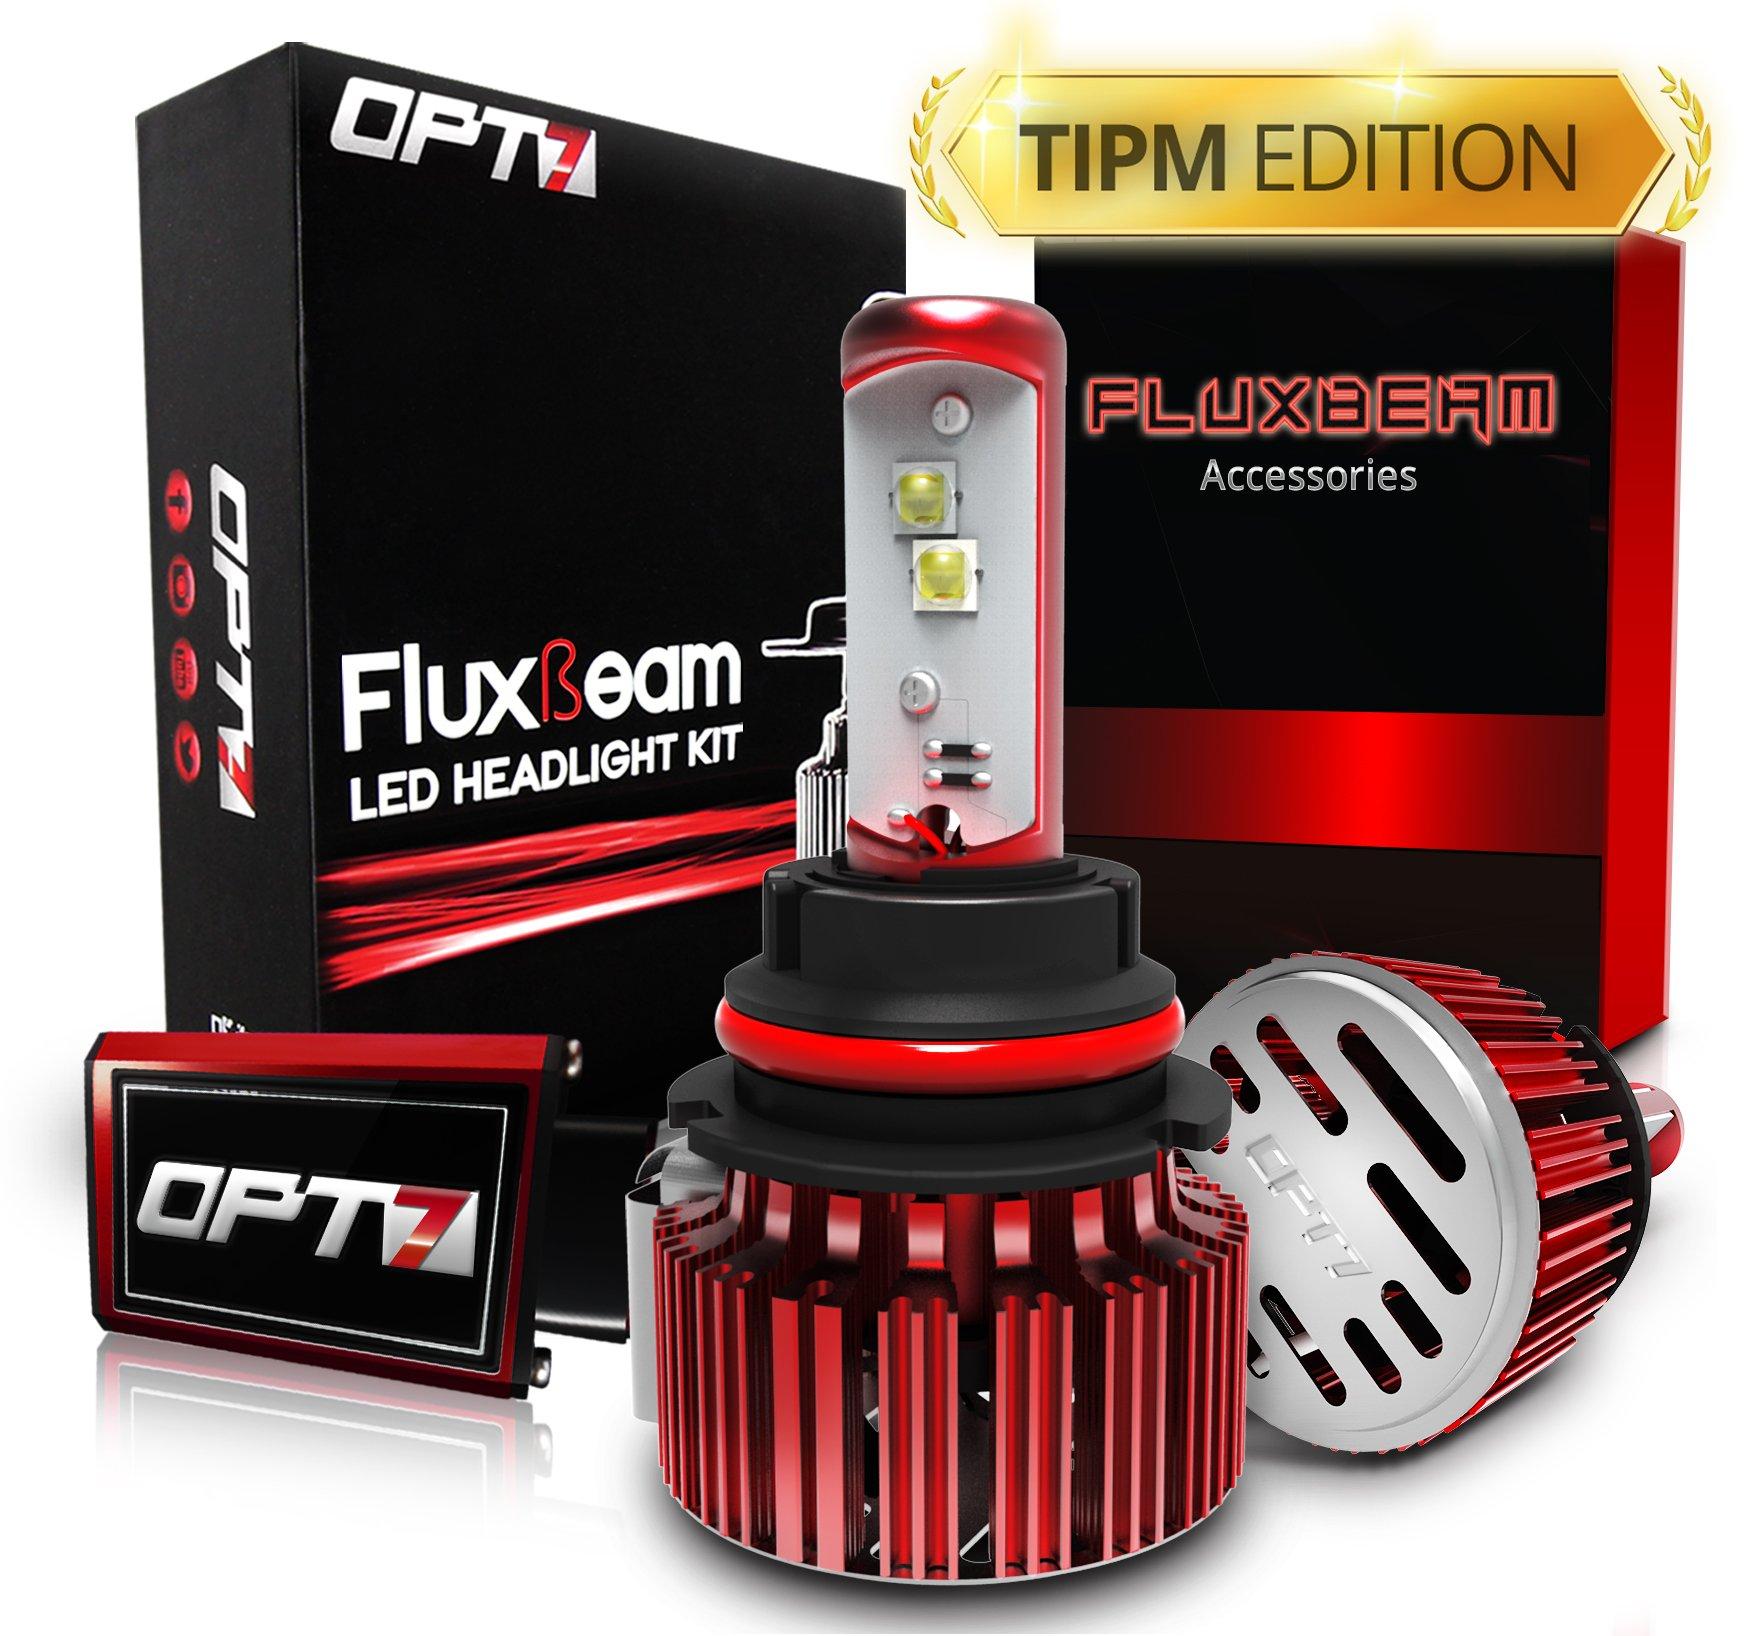 OPT7 Fluxbeam 9007 LED Headlight Bulbs w/TIPM Resistors Kit - 80w 7,000Lm 6K Cool White CREE - 2 Yr Warranty - for Dodge, RAM, Jeep, Chrysler